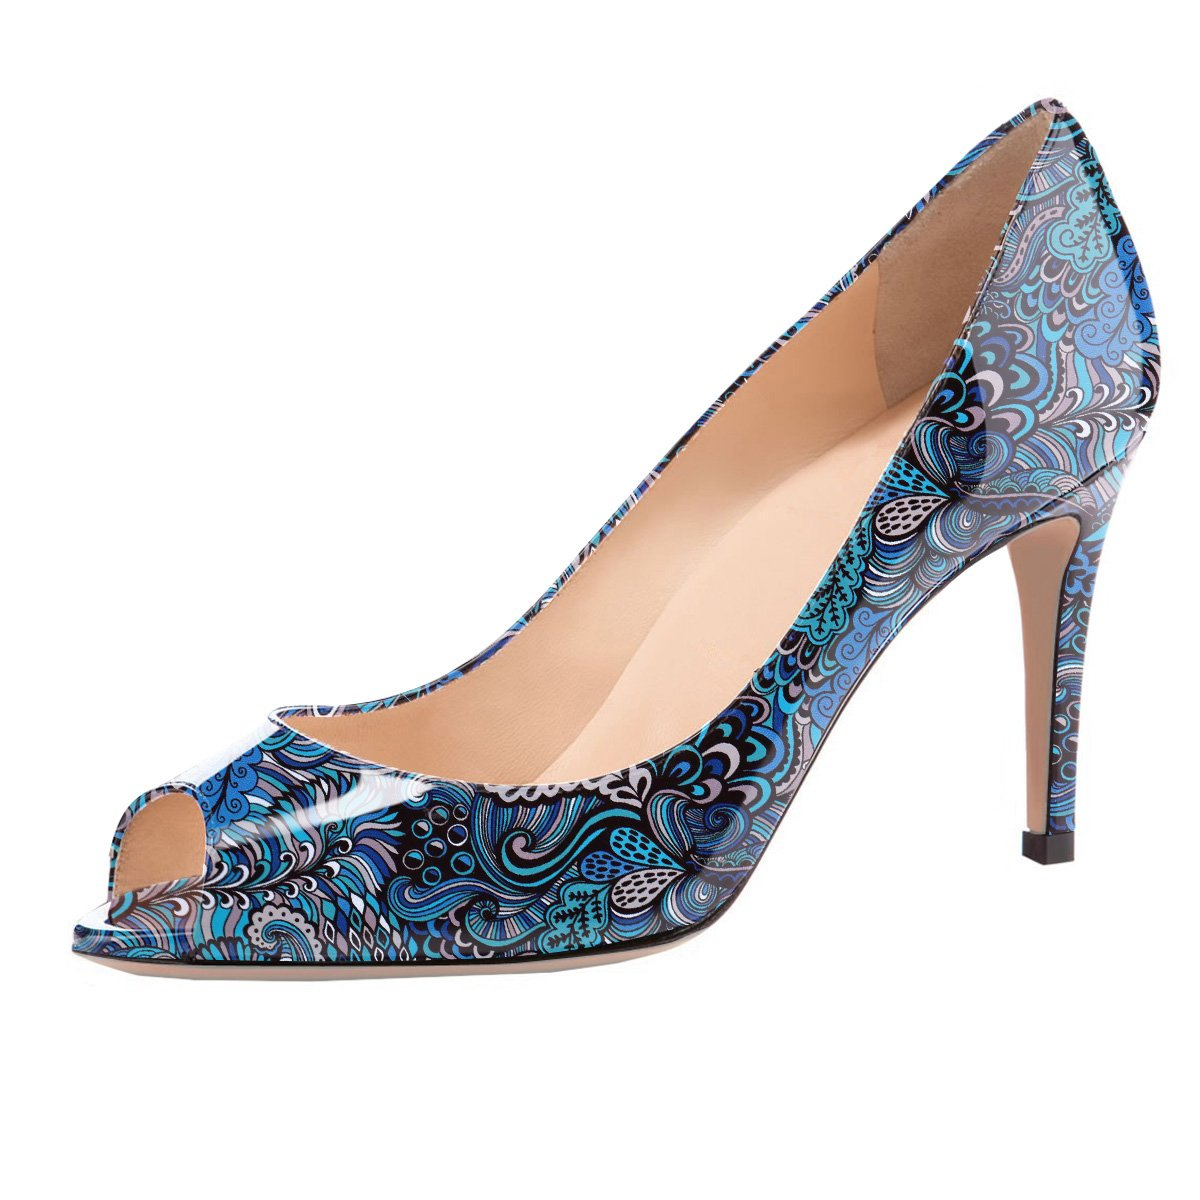 Eldof Women Peep Toe Pumps Mid-Heel Pumps Formal Wedding Bridal Classic Heel Open Toe Stiletto B07FHLK2M1 10.5 B(M) US|Blue-pattern